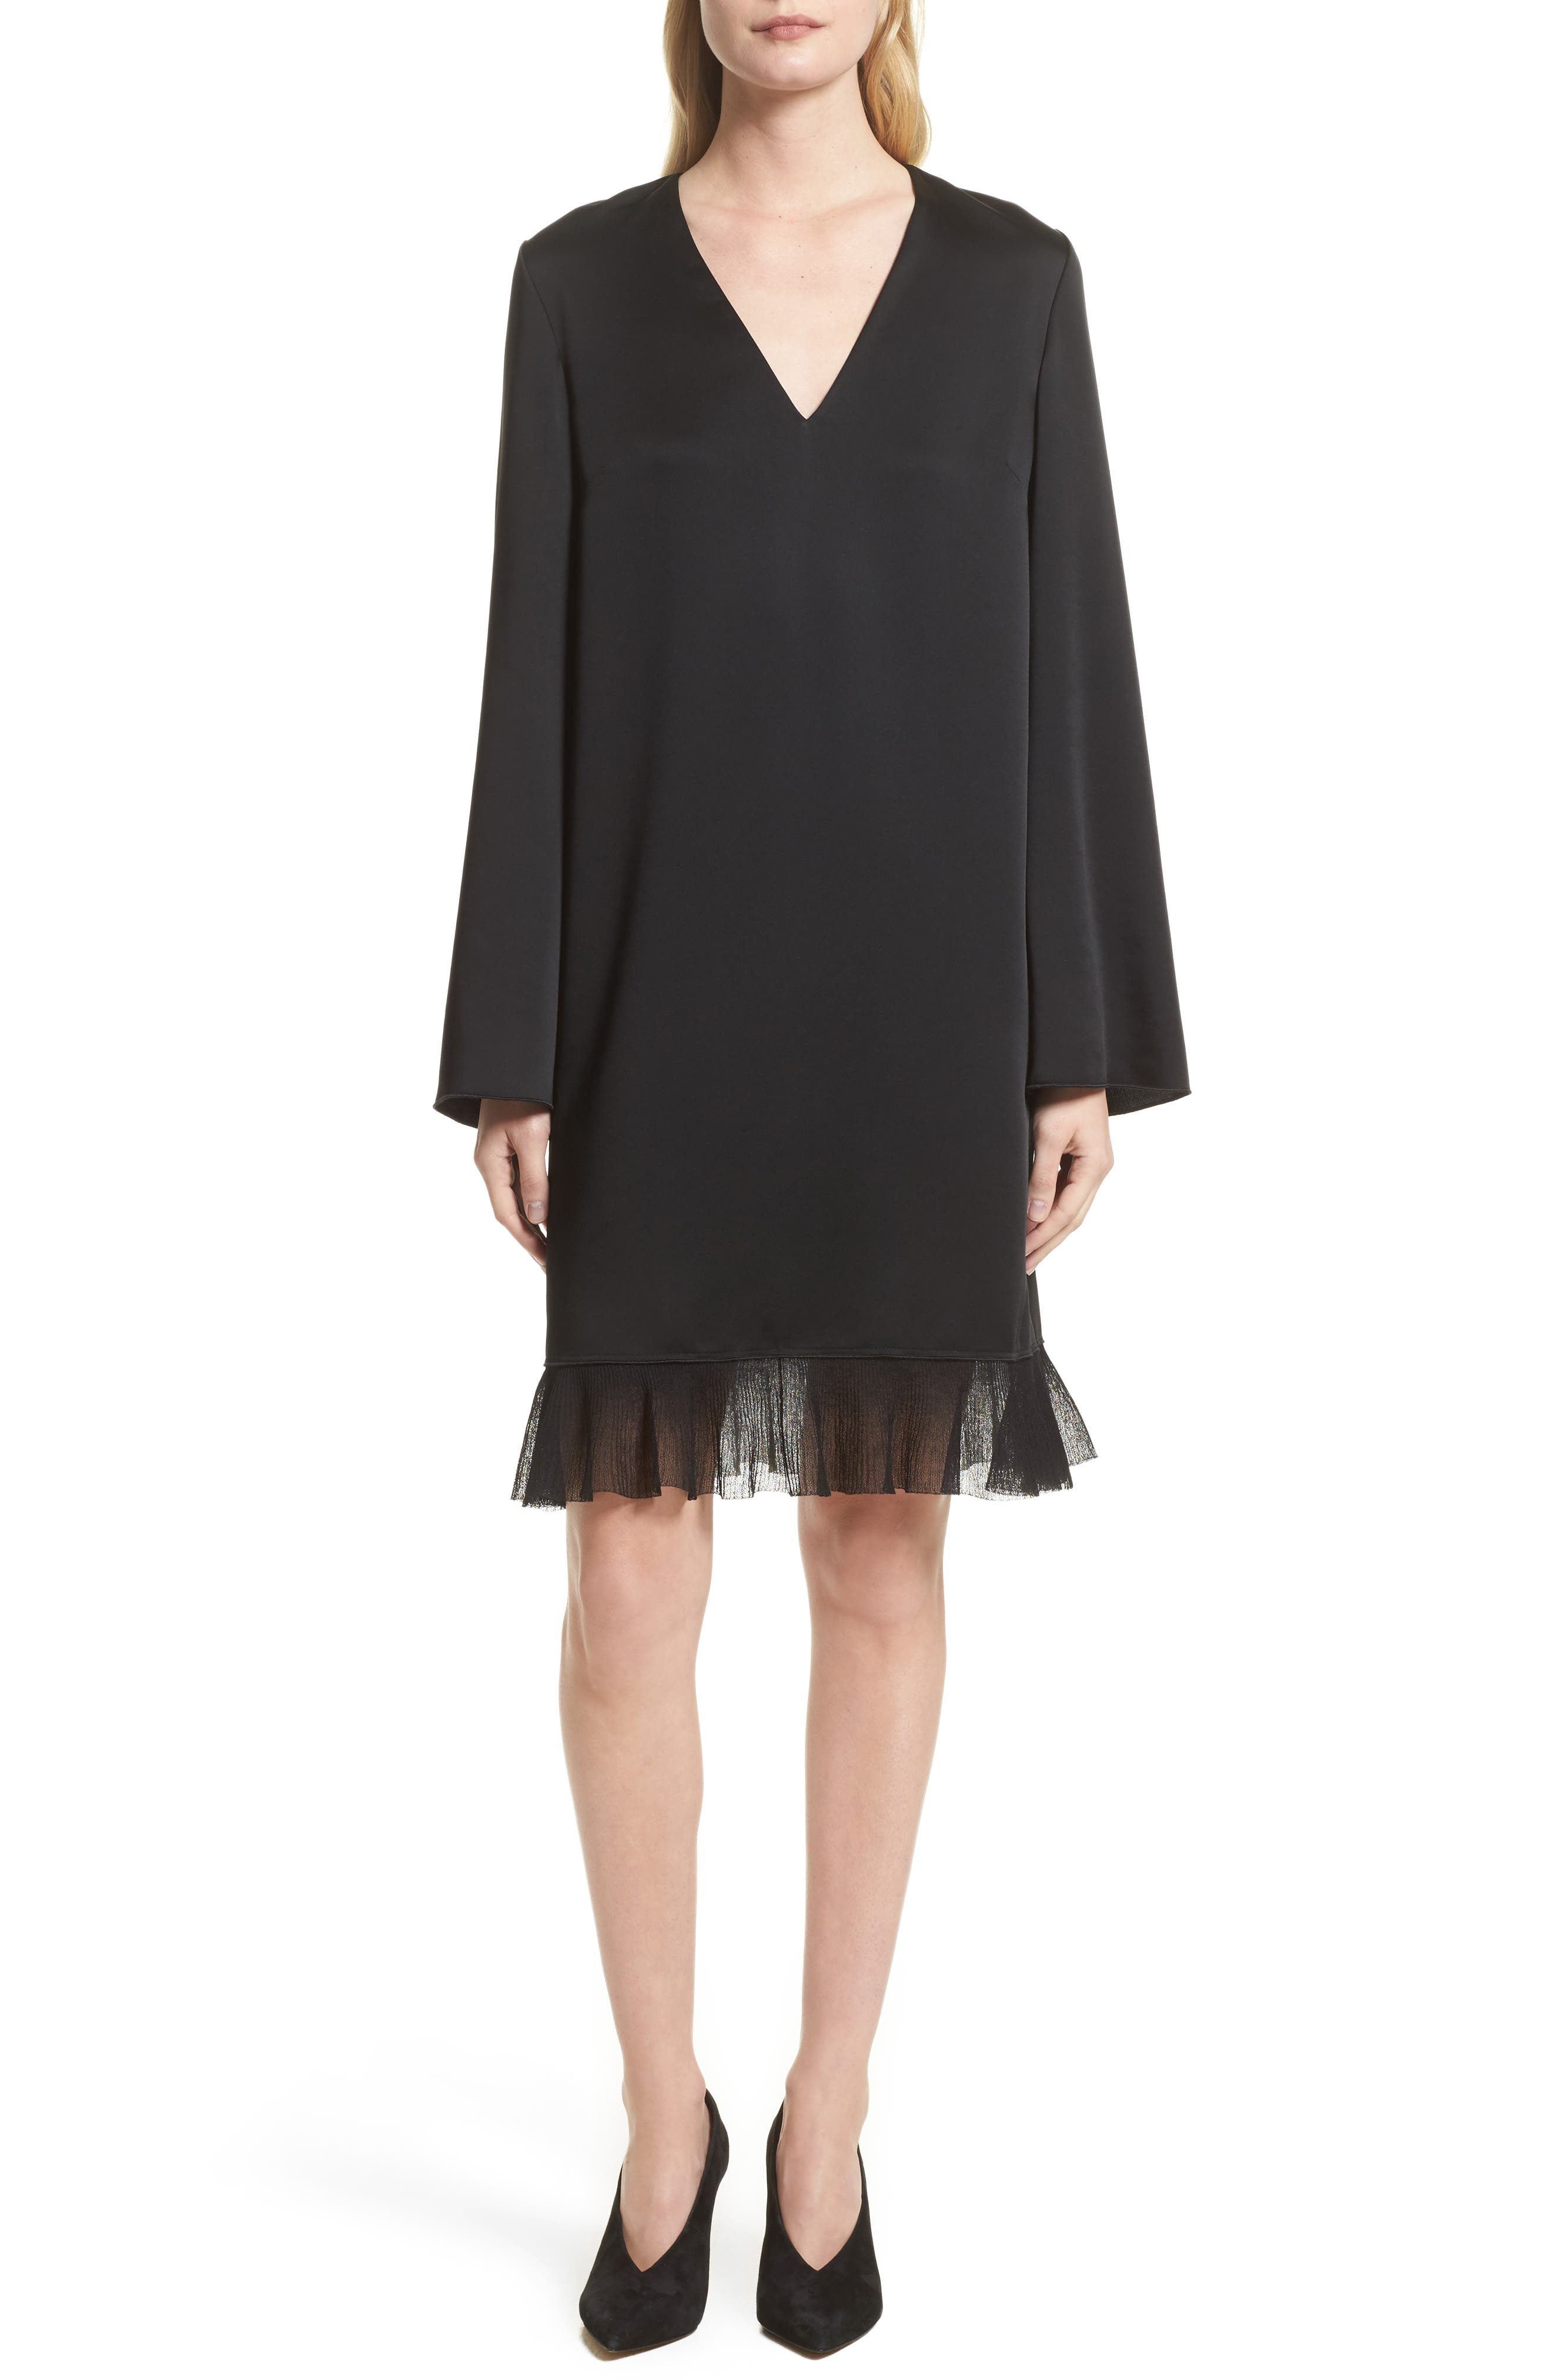 Heath Shift Dress,                         Main,                         color, Black